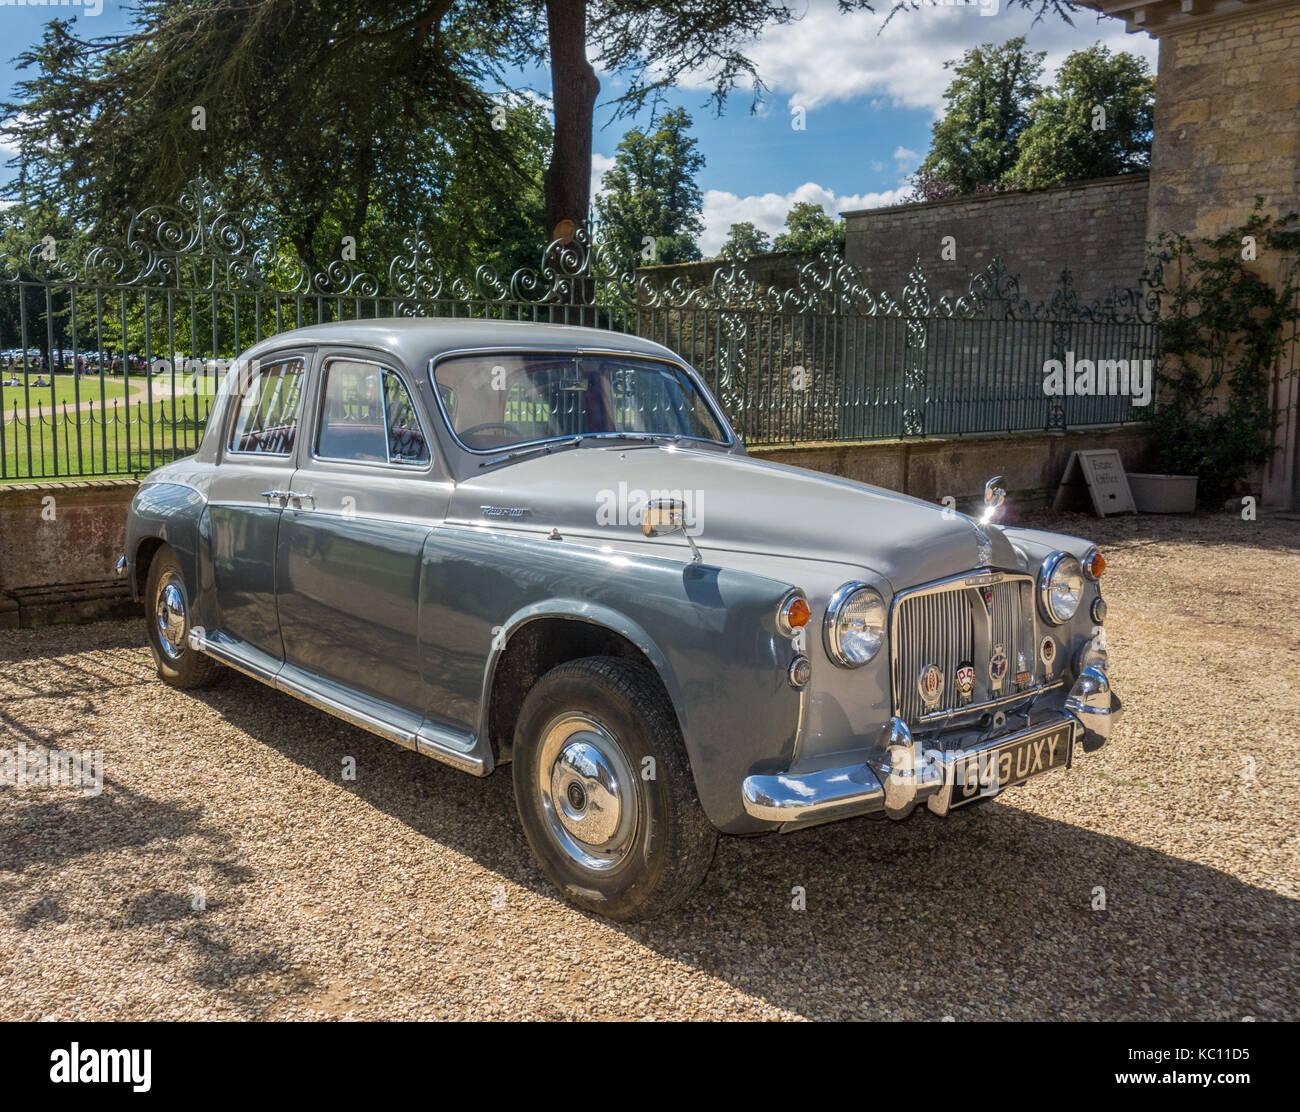 Classic British motorcar - Stock Image